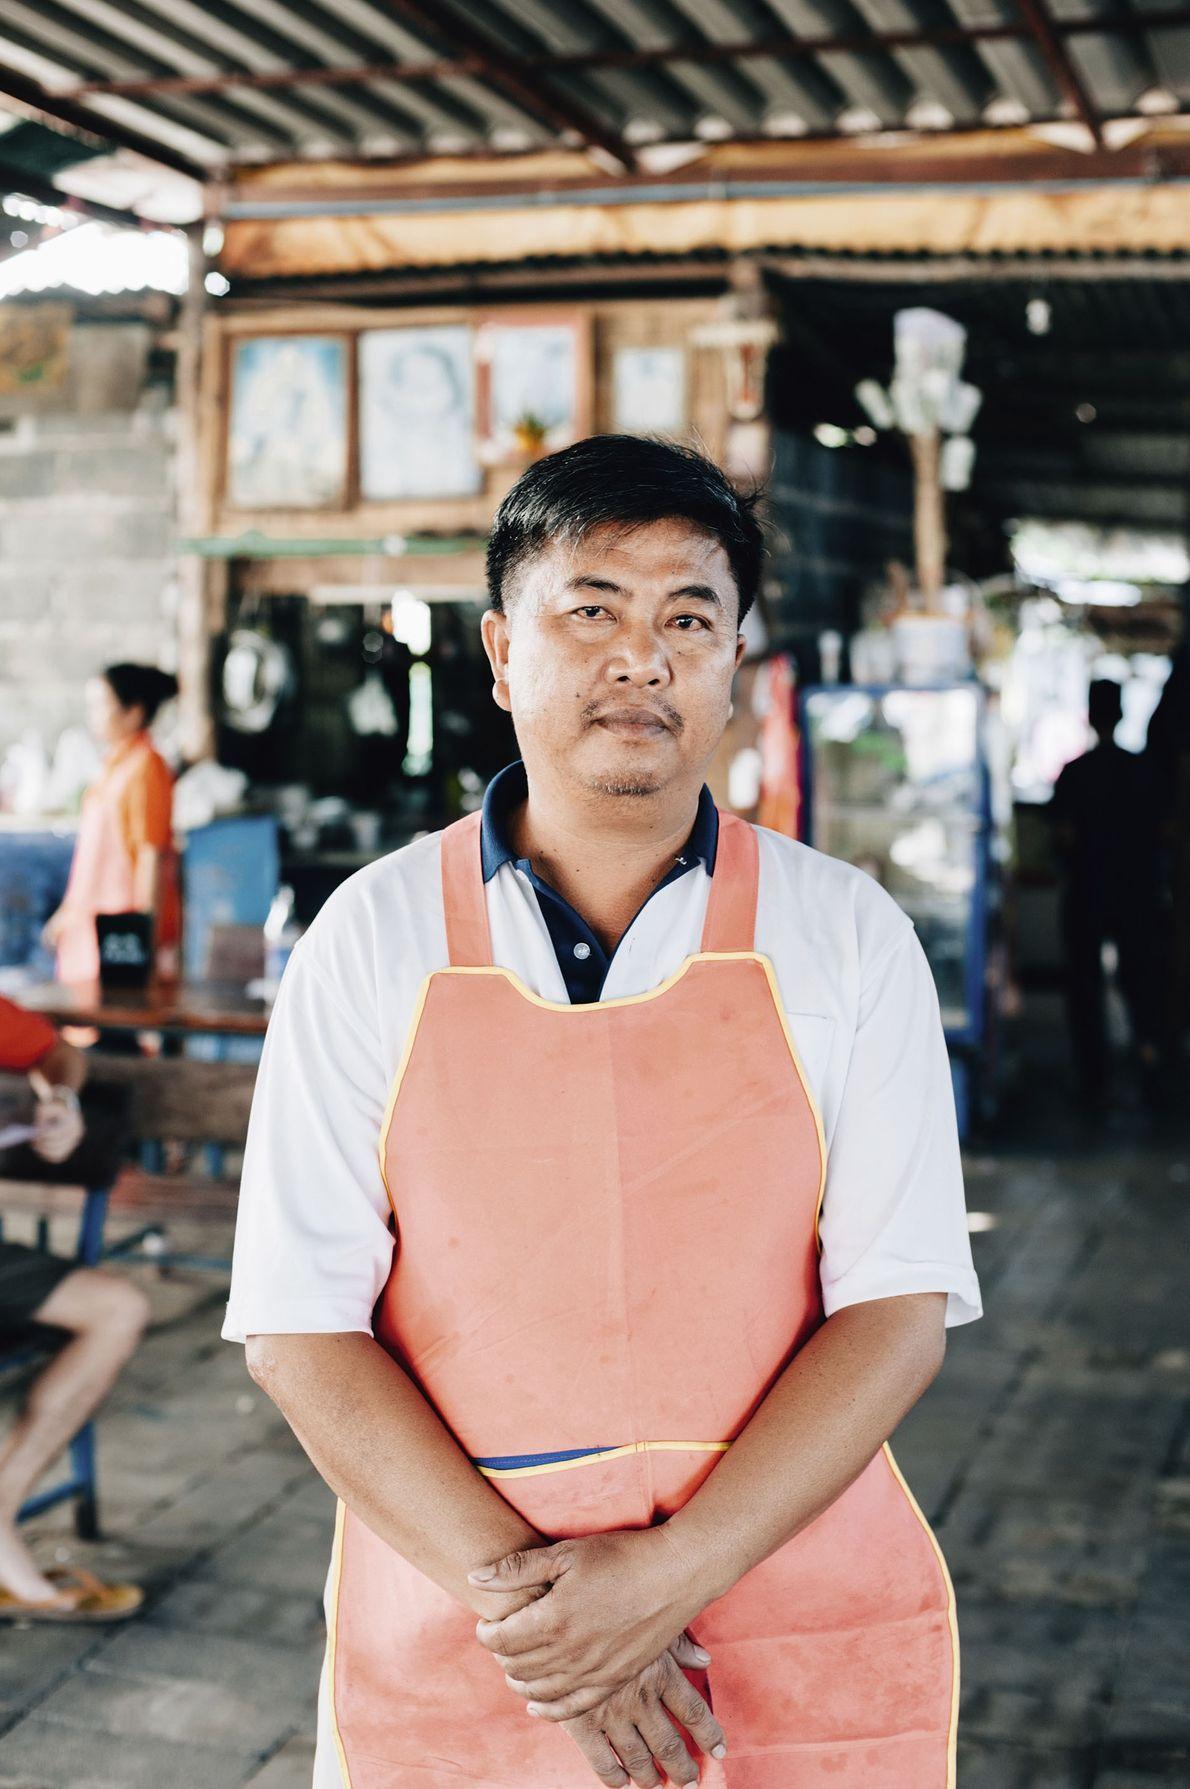 A man in Nakhon Phanom